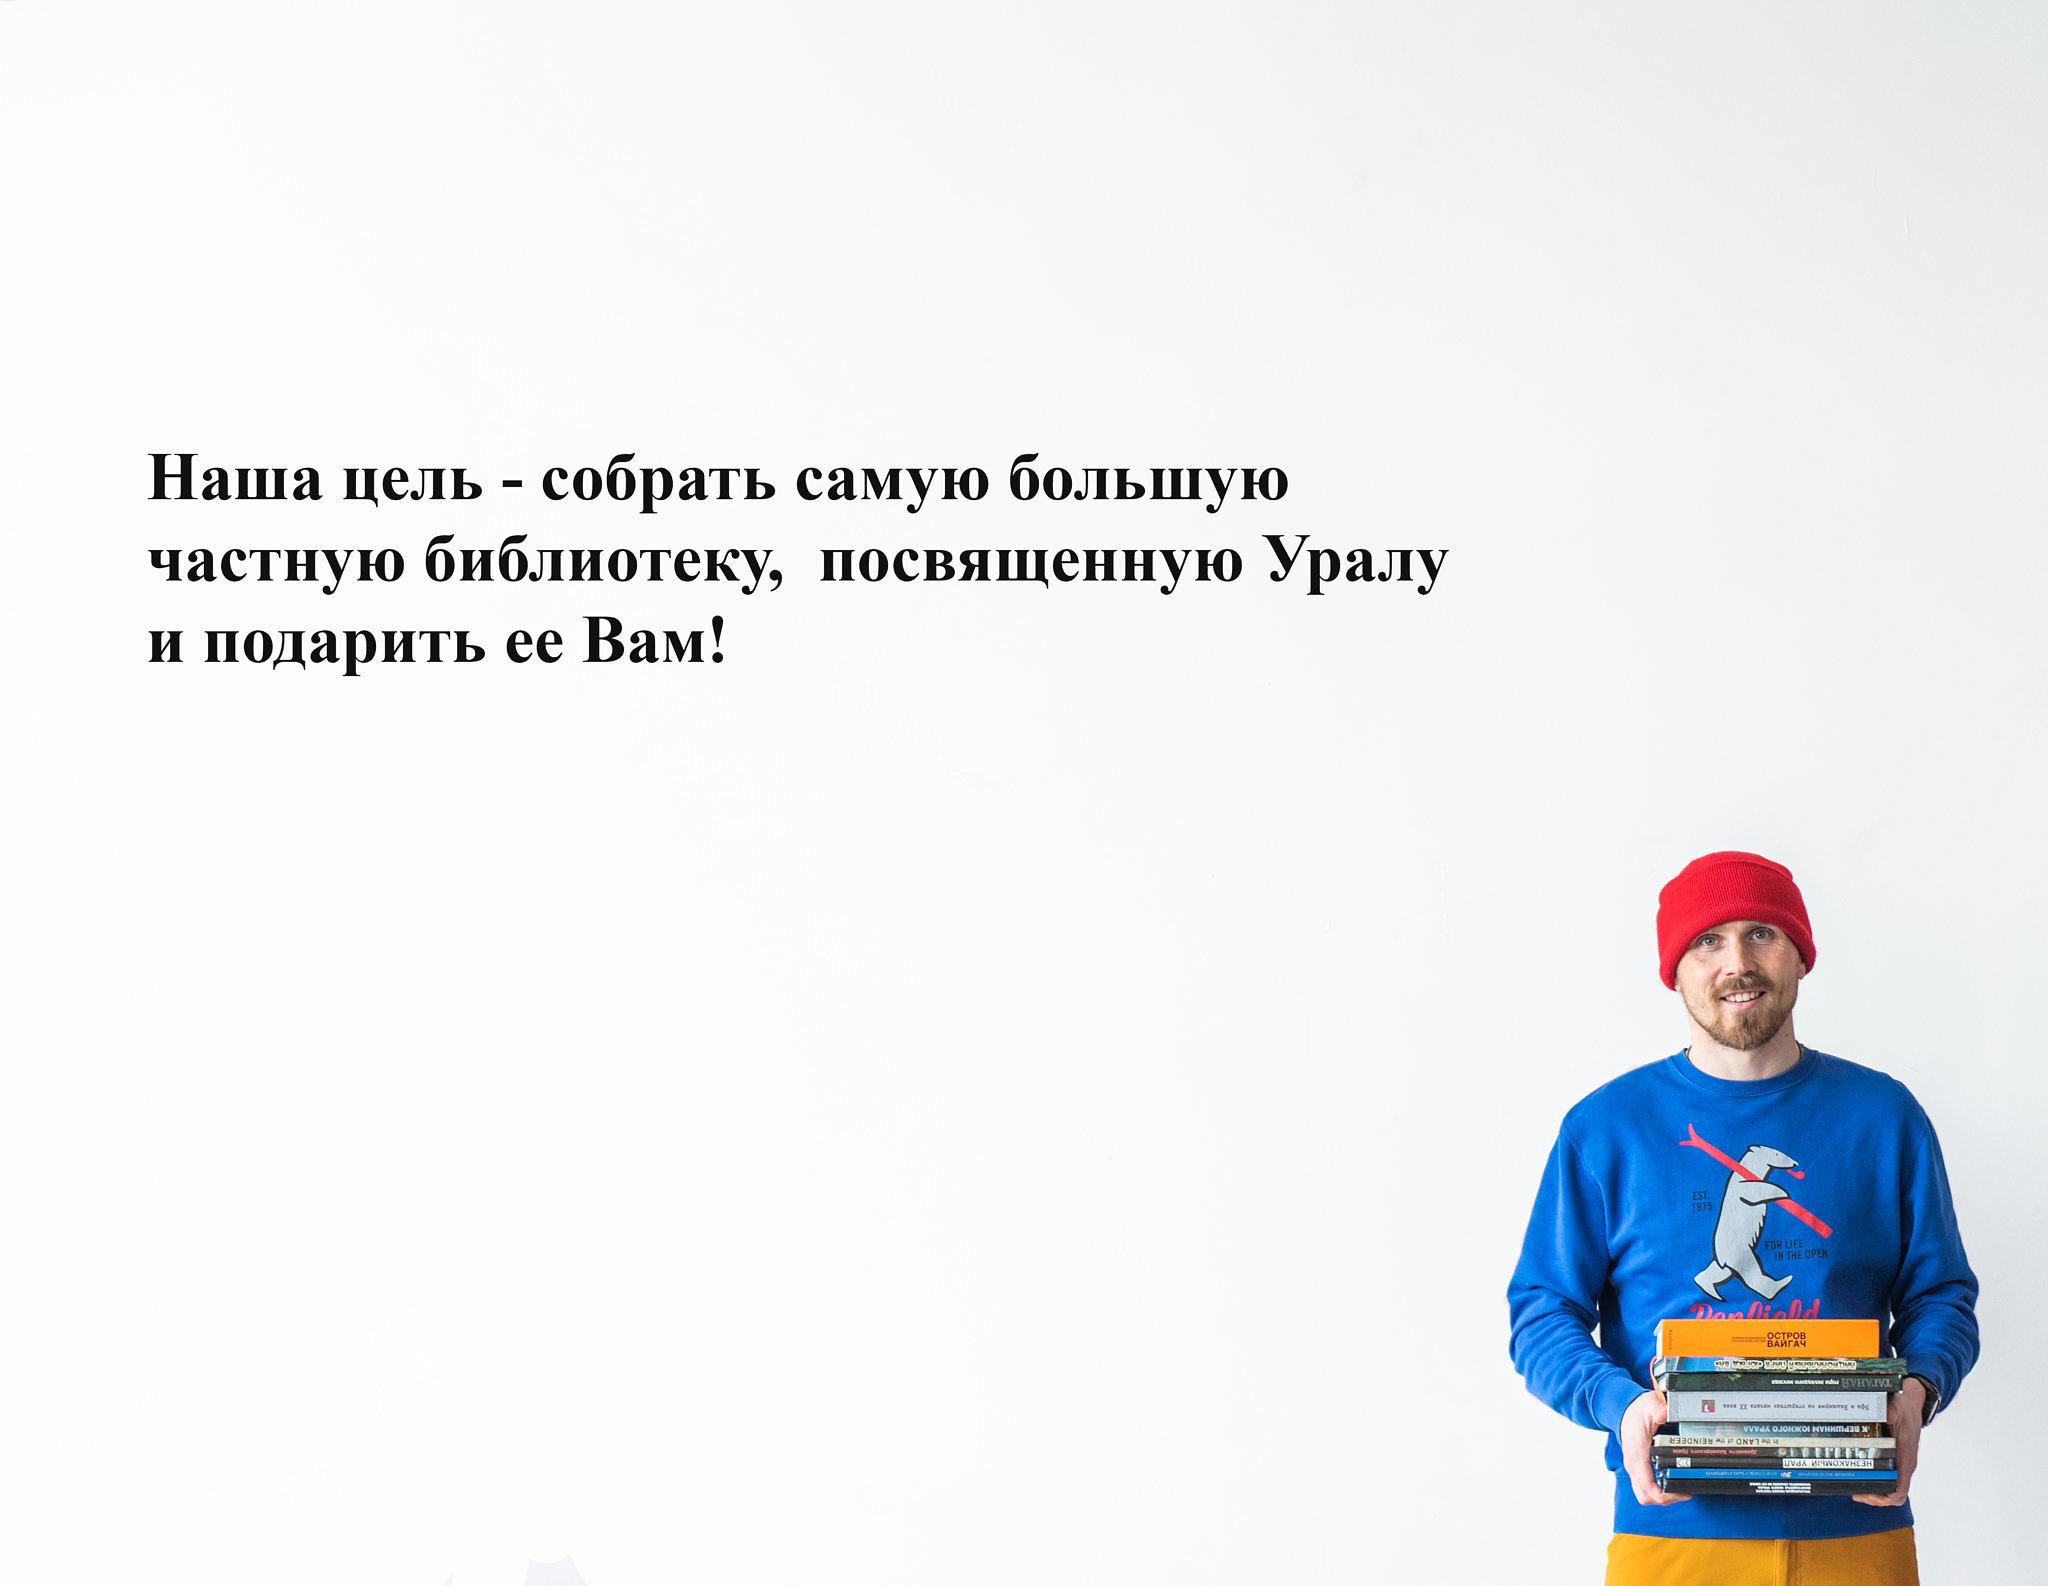 Олег чегодаев